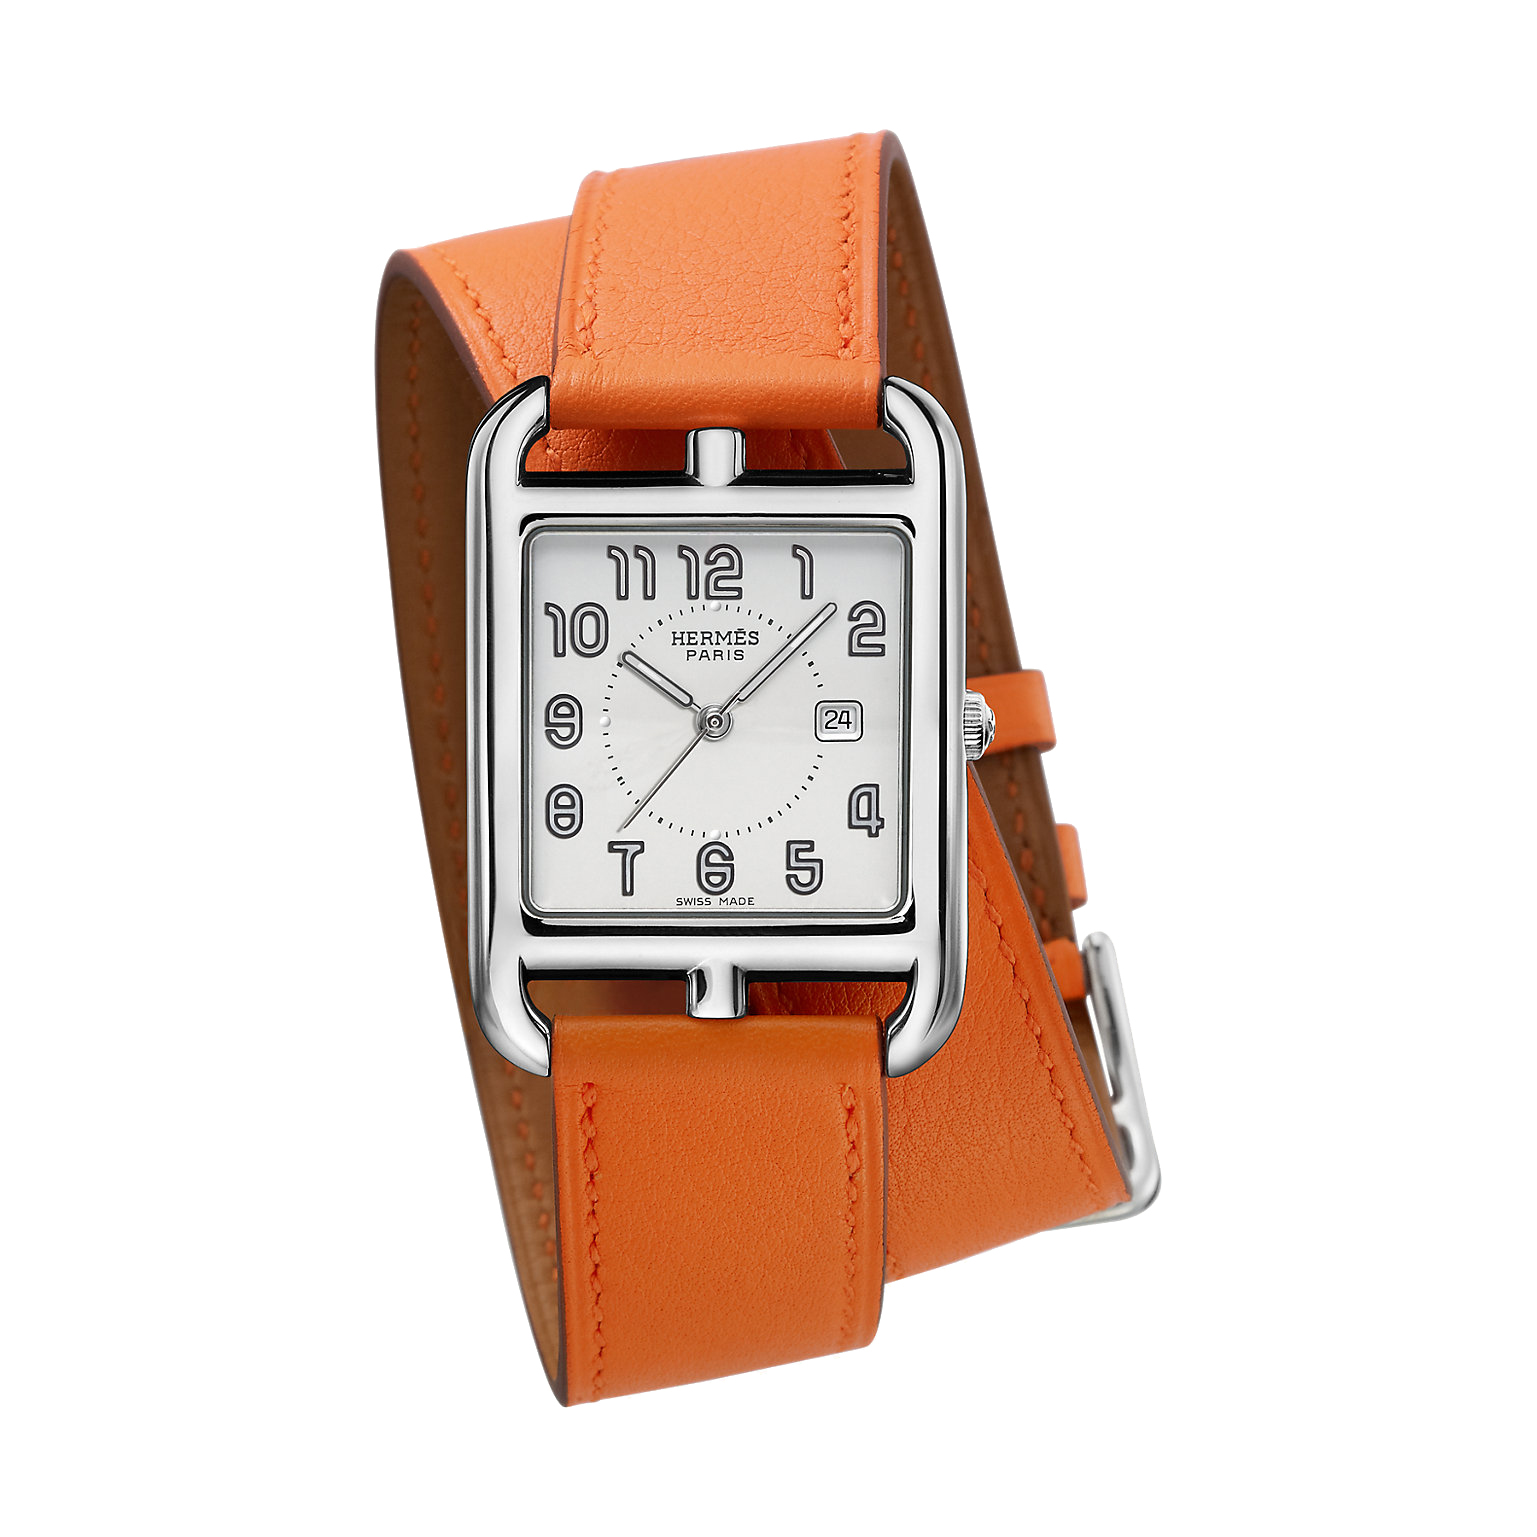 Hermès-cape-cod-29-x-29mm-Hall-of-Time-043665WW00